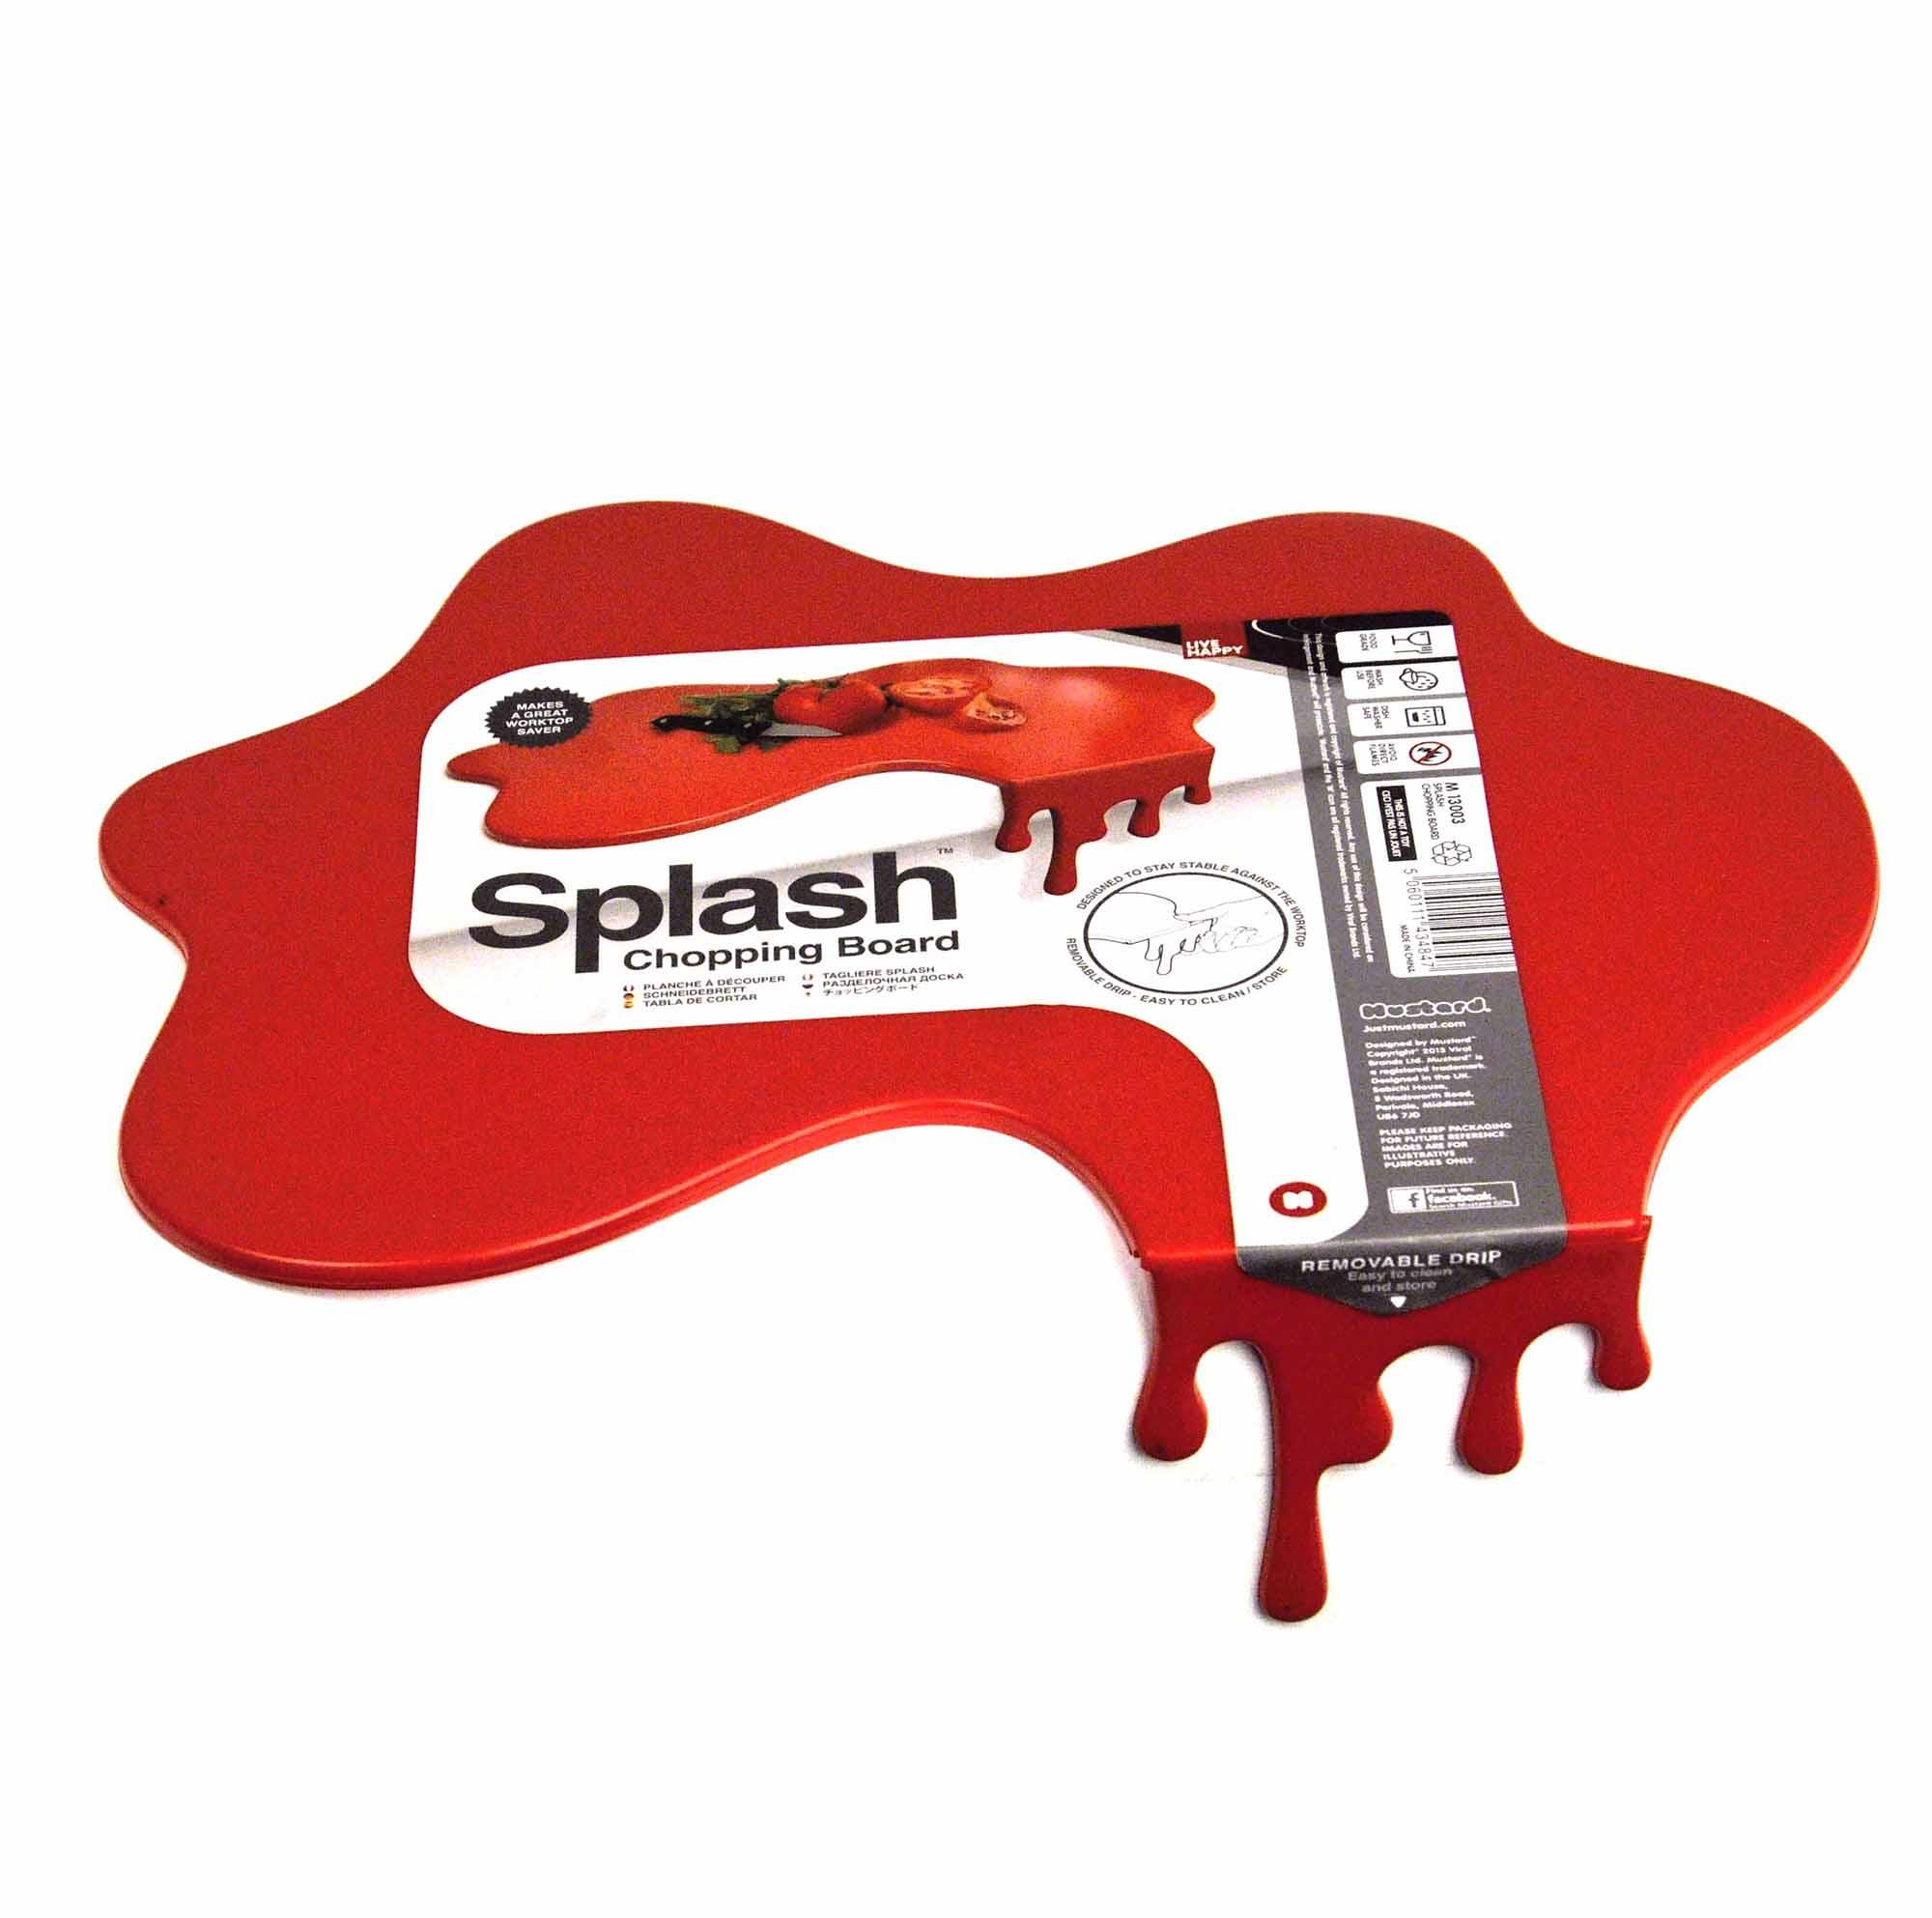 Splashed chopping board ebay for Splash board kitchen